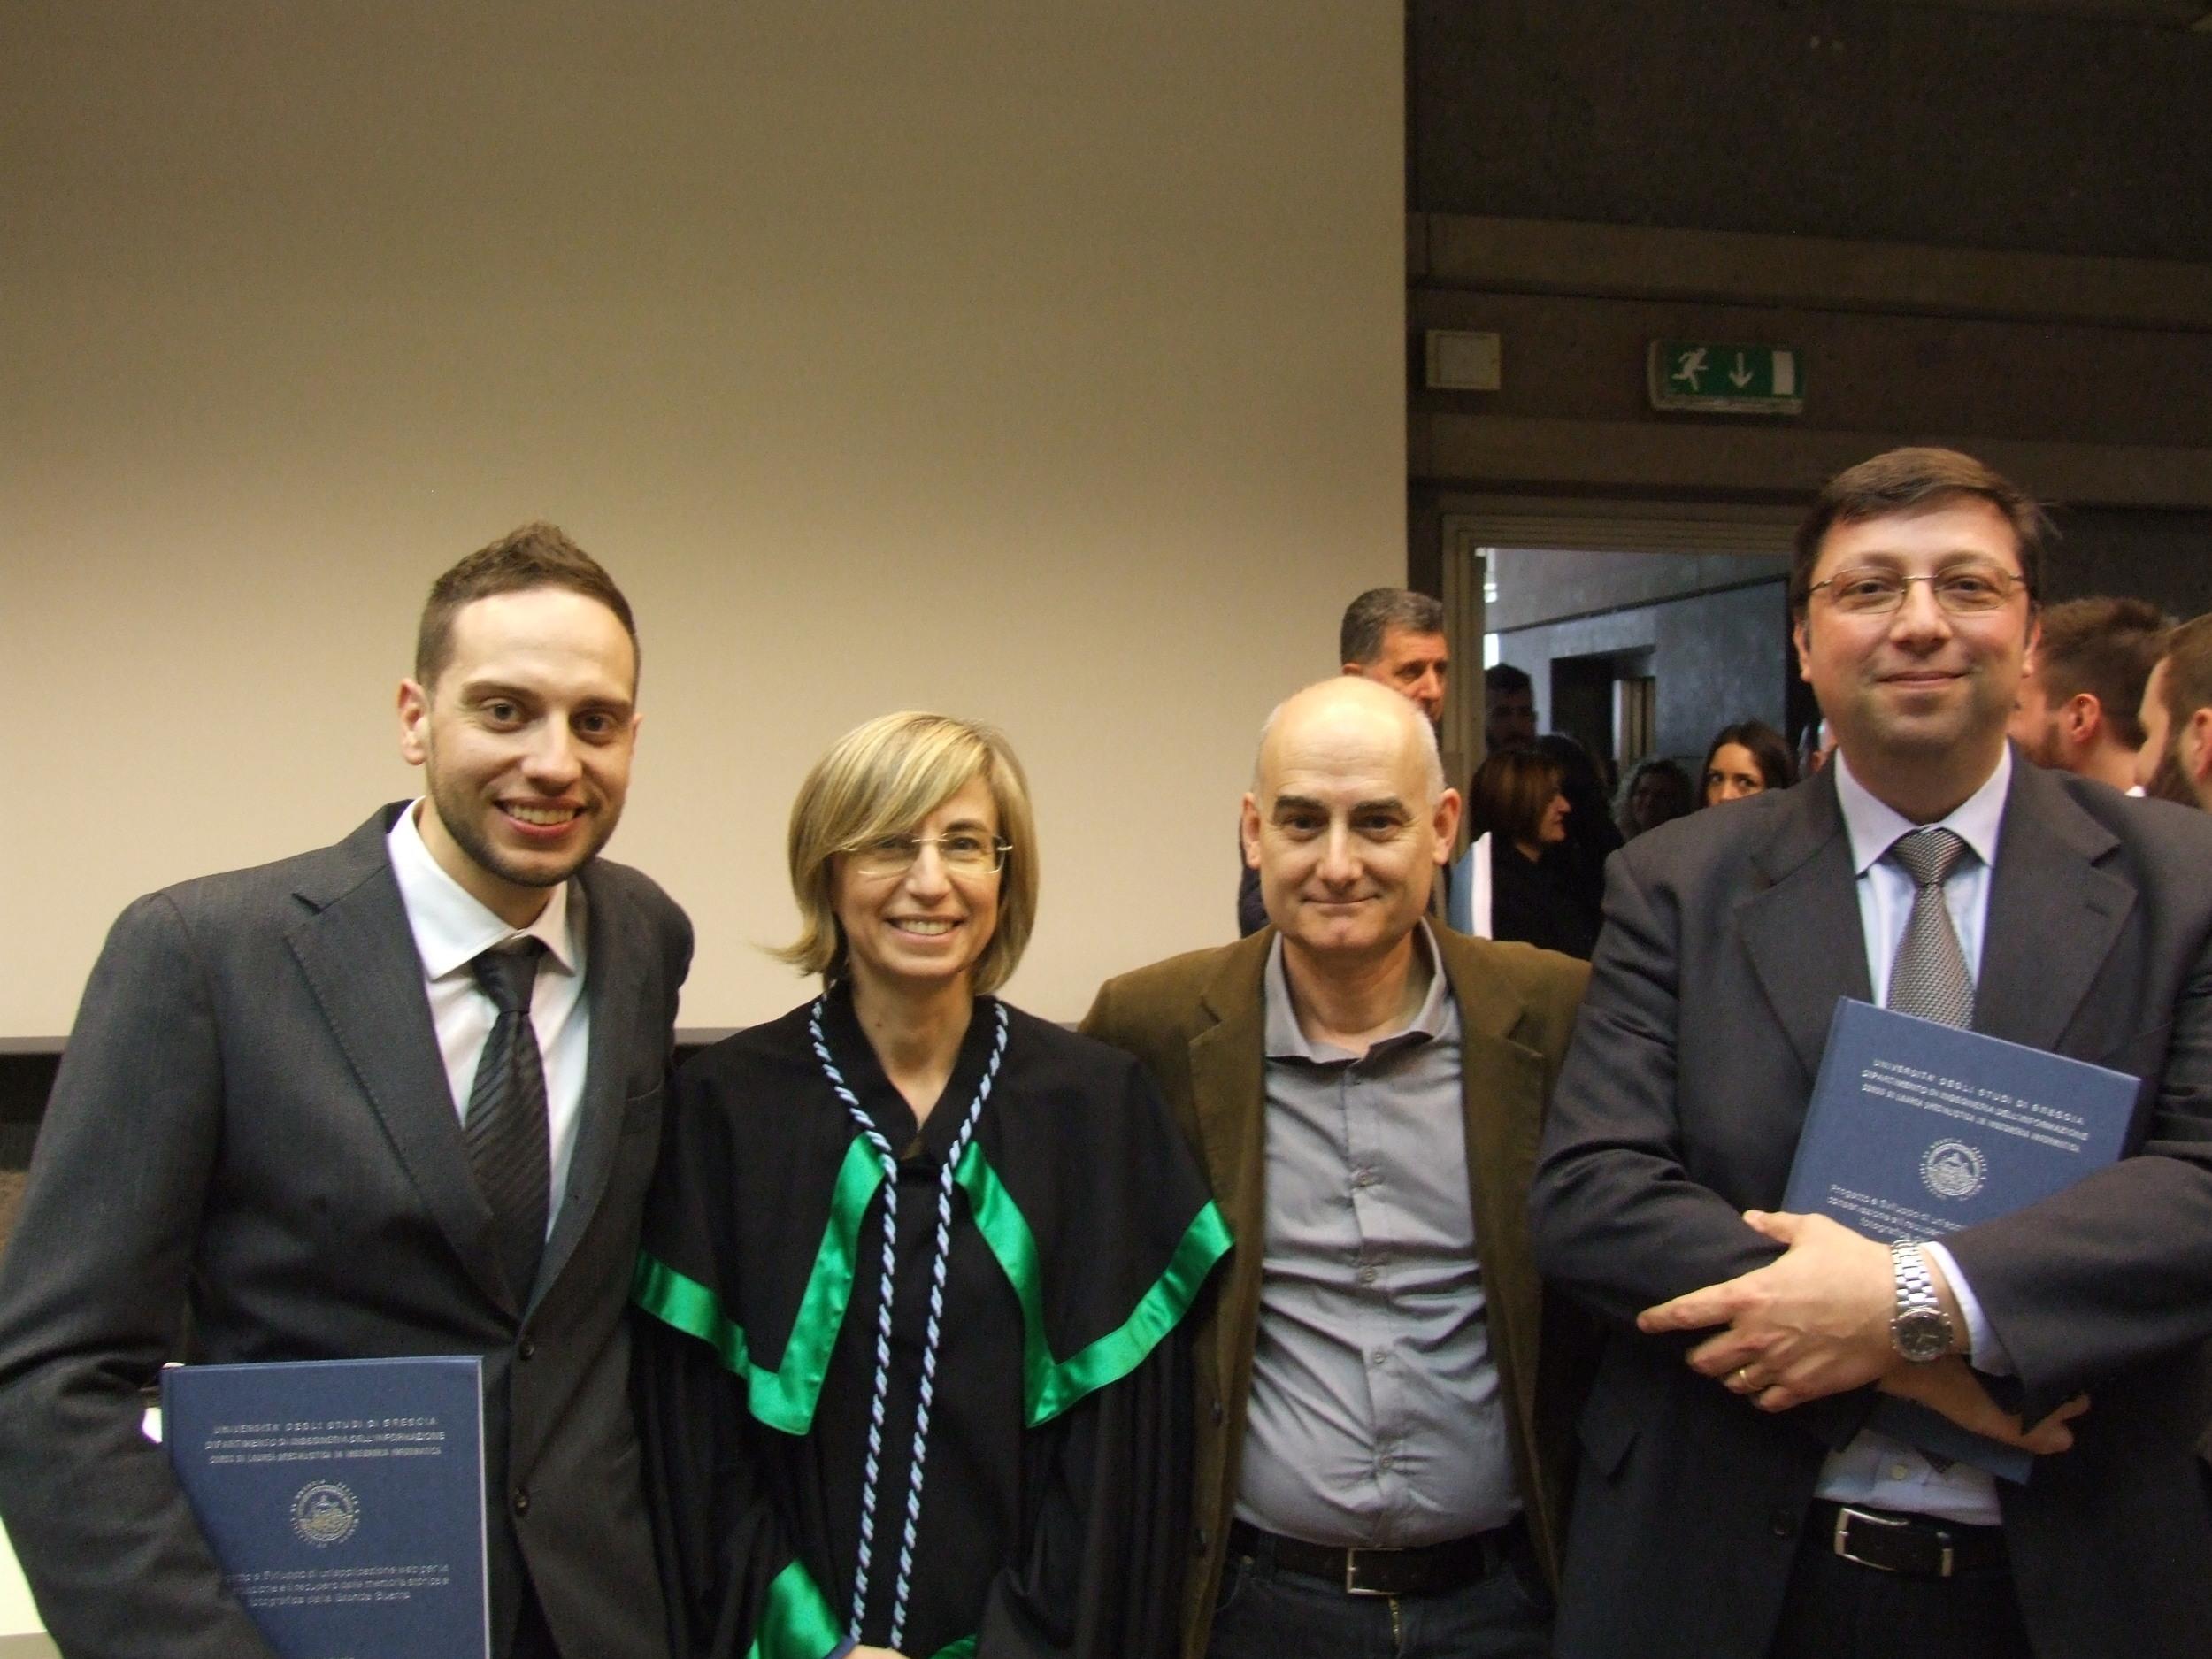 Correlatore alla tesi di Laurea Specialistica in Ingegneria Informatica - Brescia